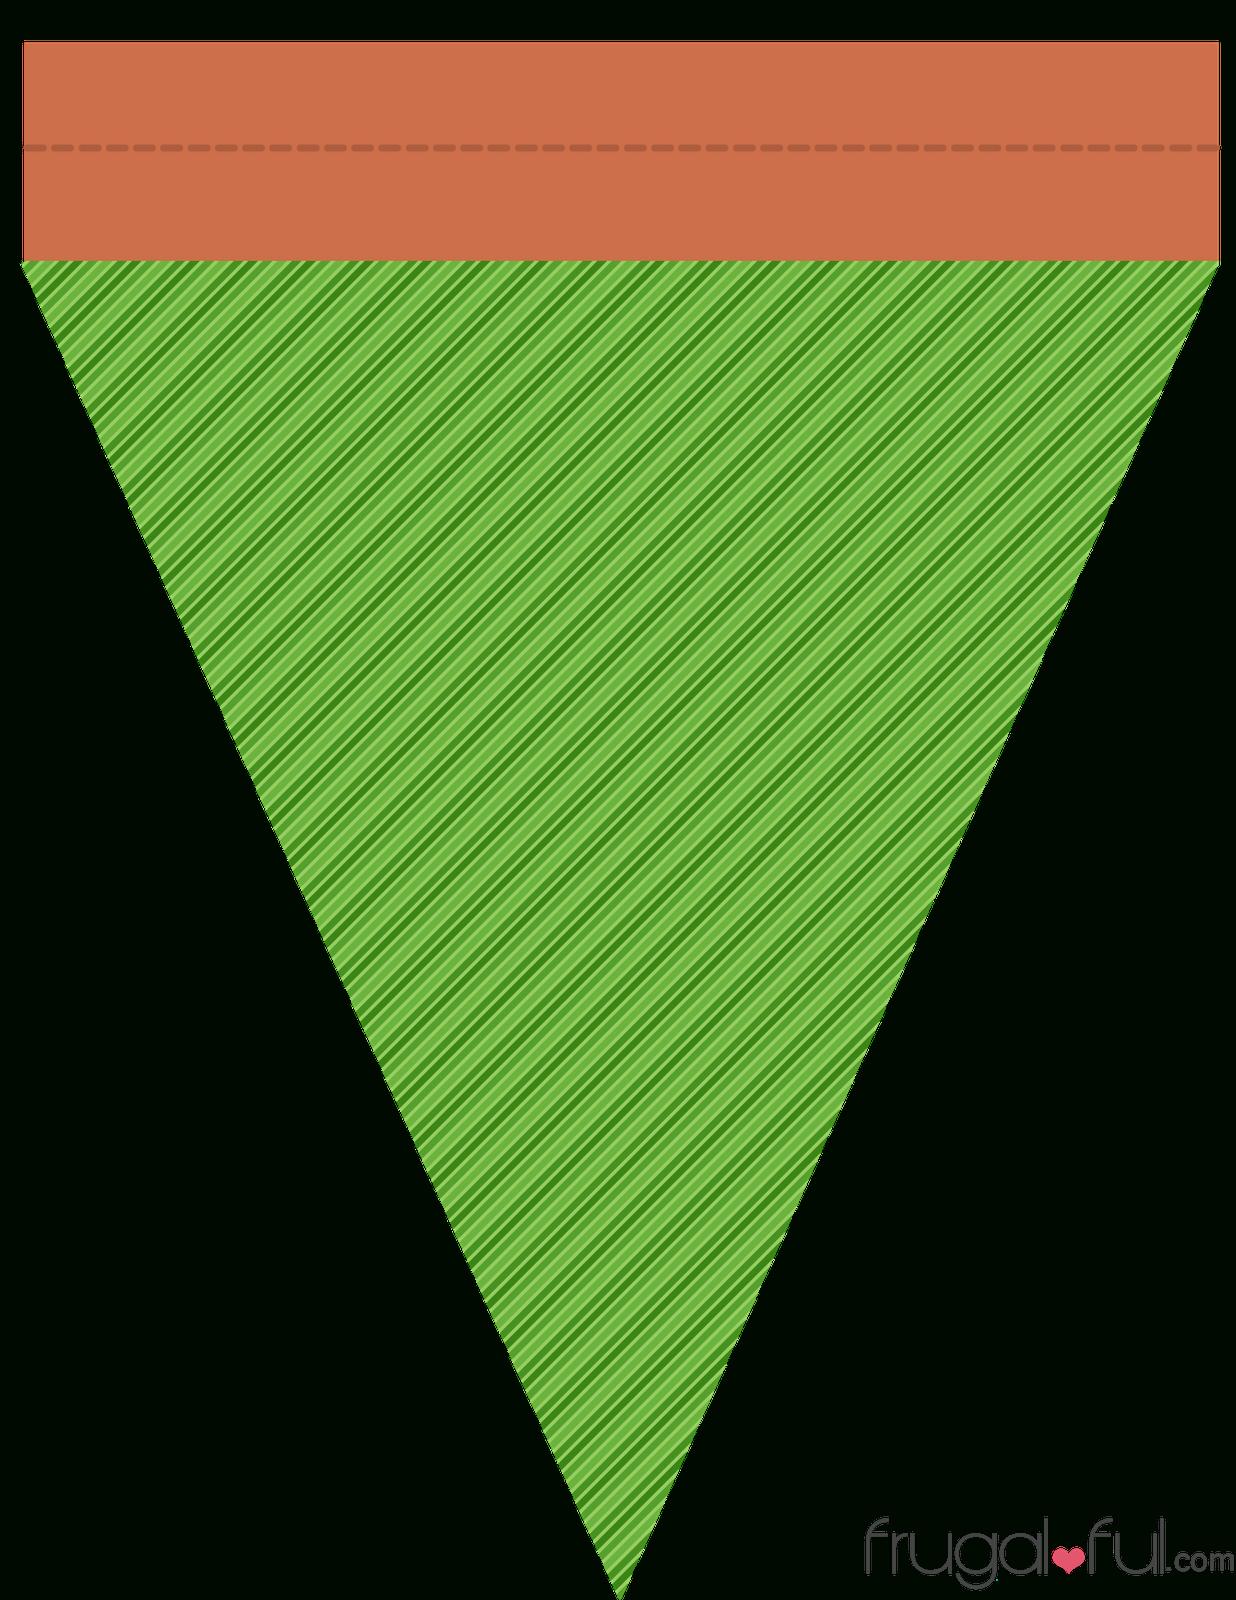 Diy} Free Printable Halloween Triangle Banner Template (Part 2 - Free Printable Halloween Banner Templates